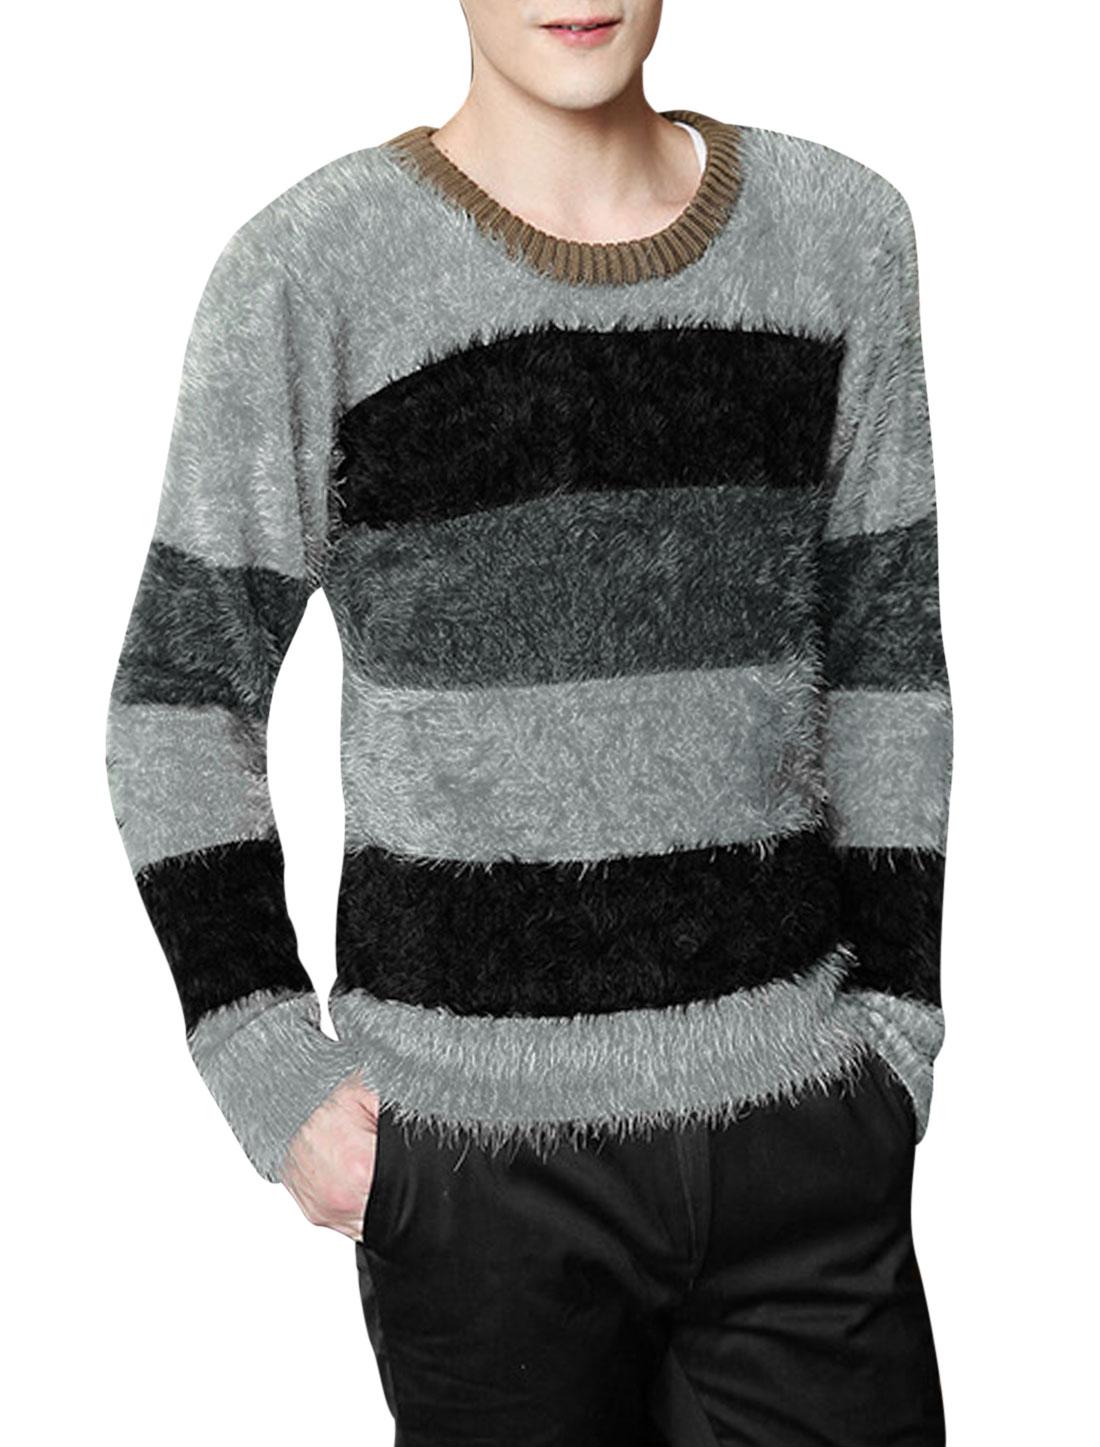 Men Round Neck Fashionable Leisure Shirt Black Light Gray M